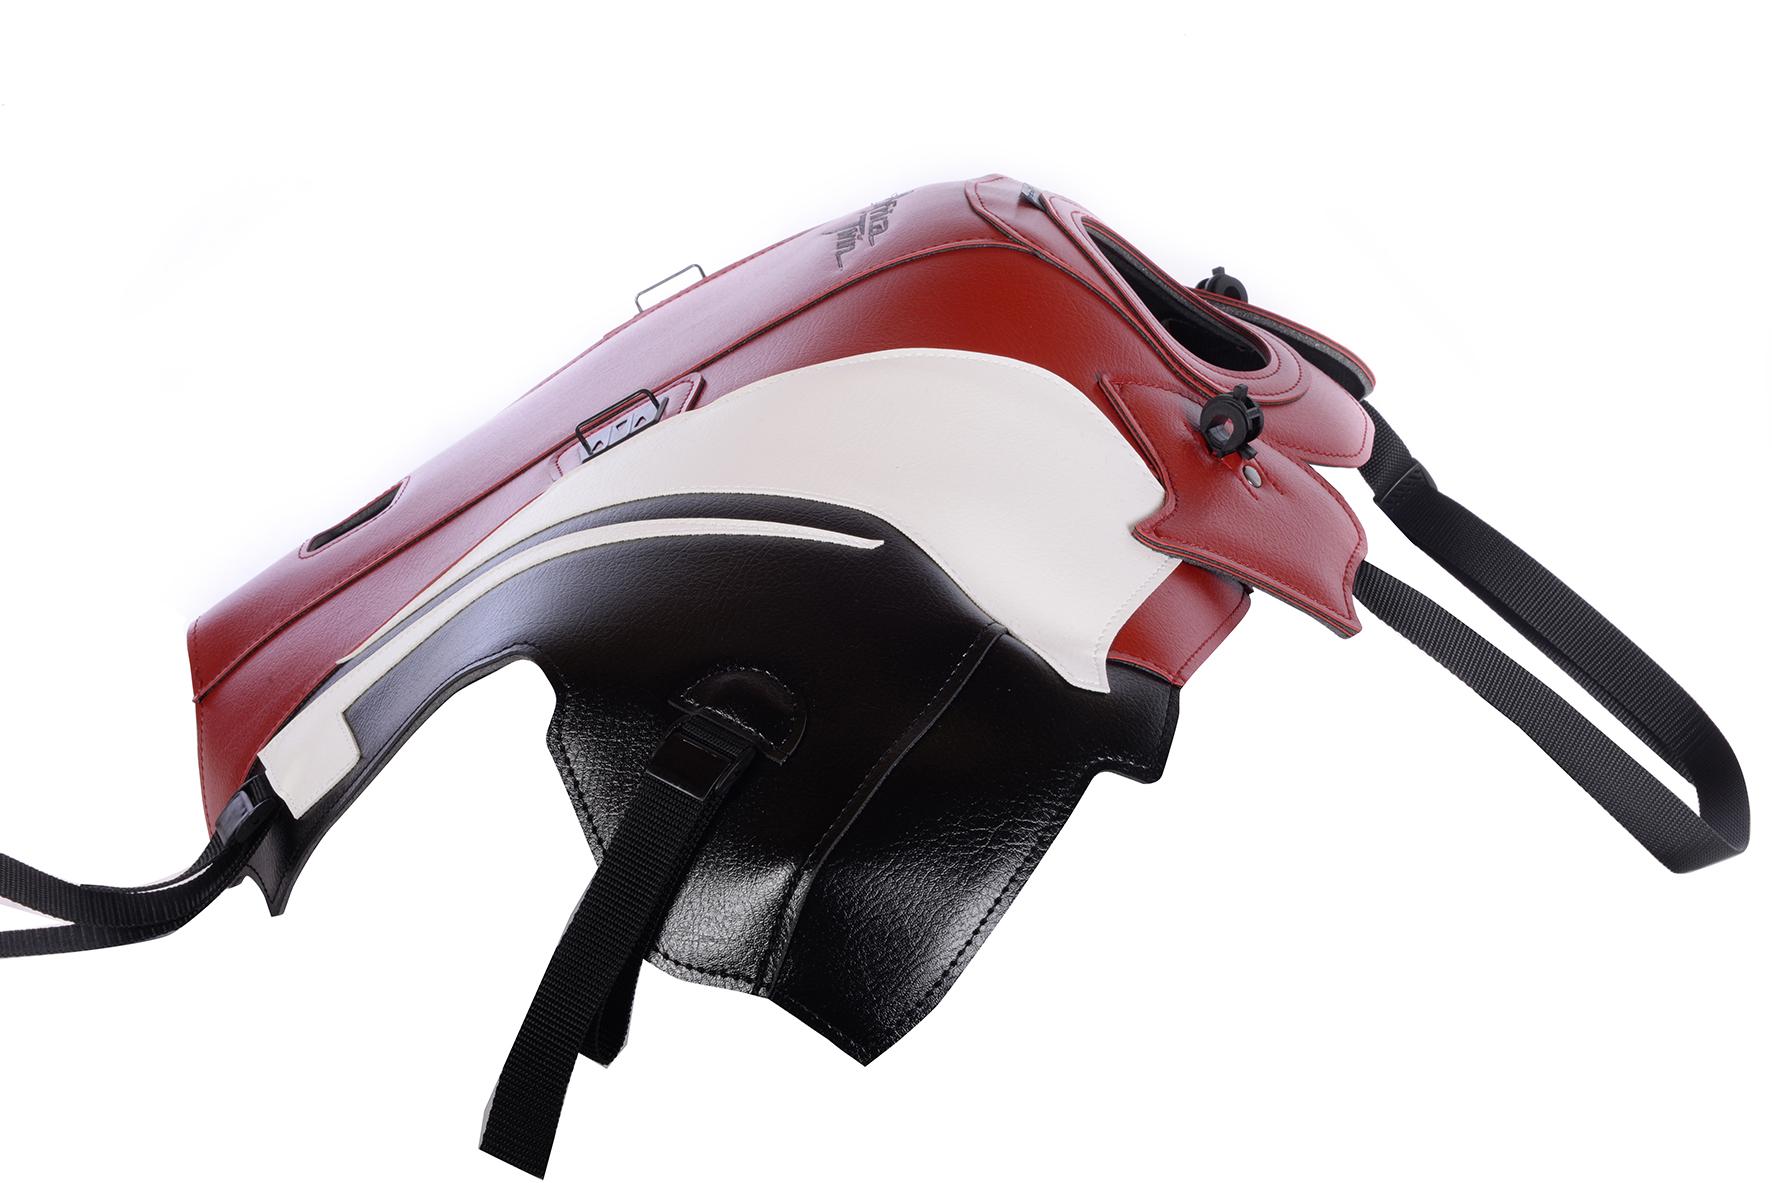 cb0b34f926b Cubredeposito Bagster para Honda CRF 1000 Africa Twin 16-17